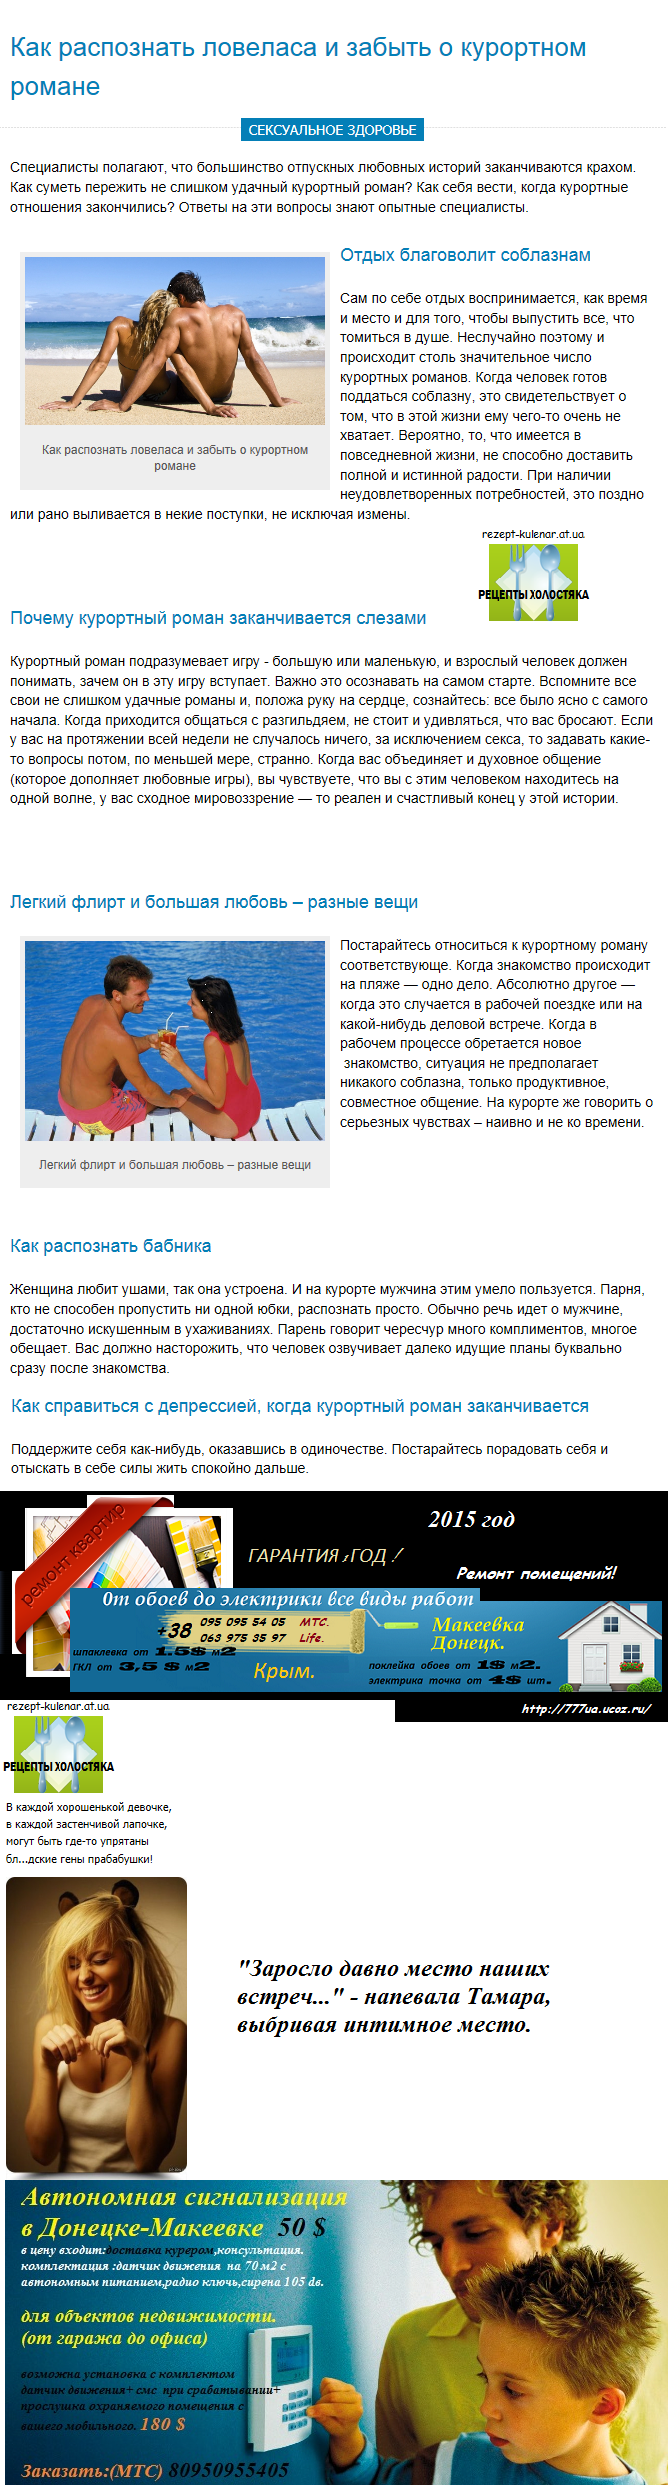 volosnya-tam-foto